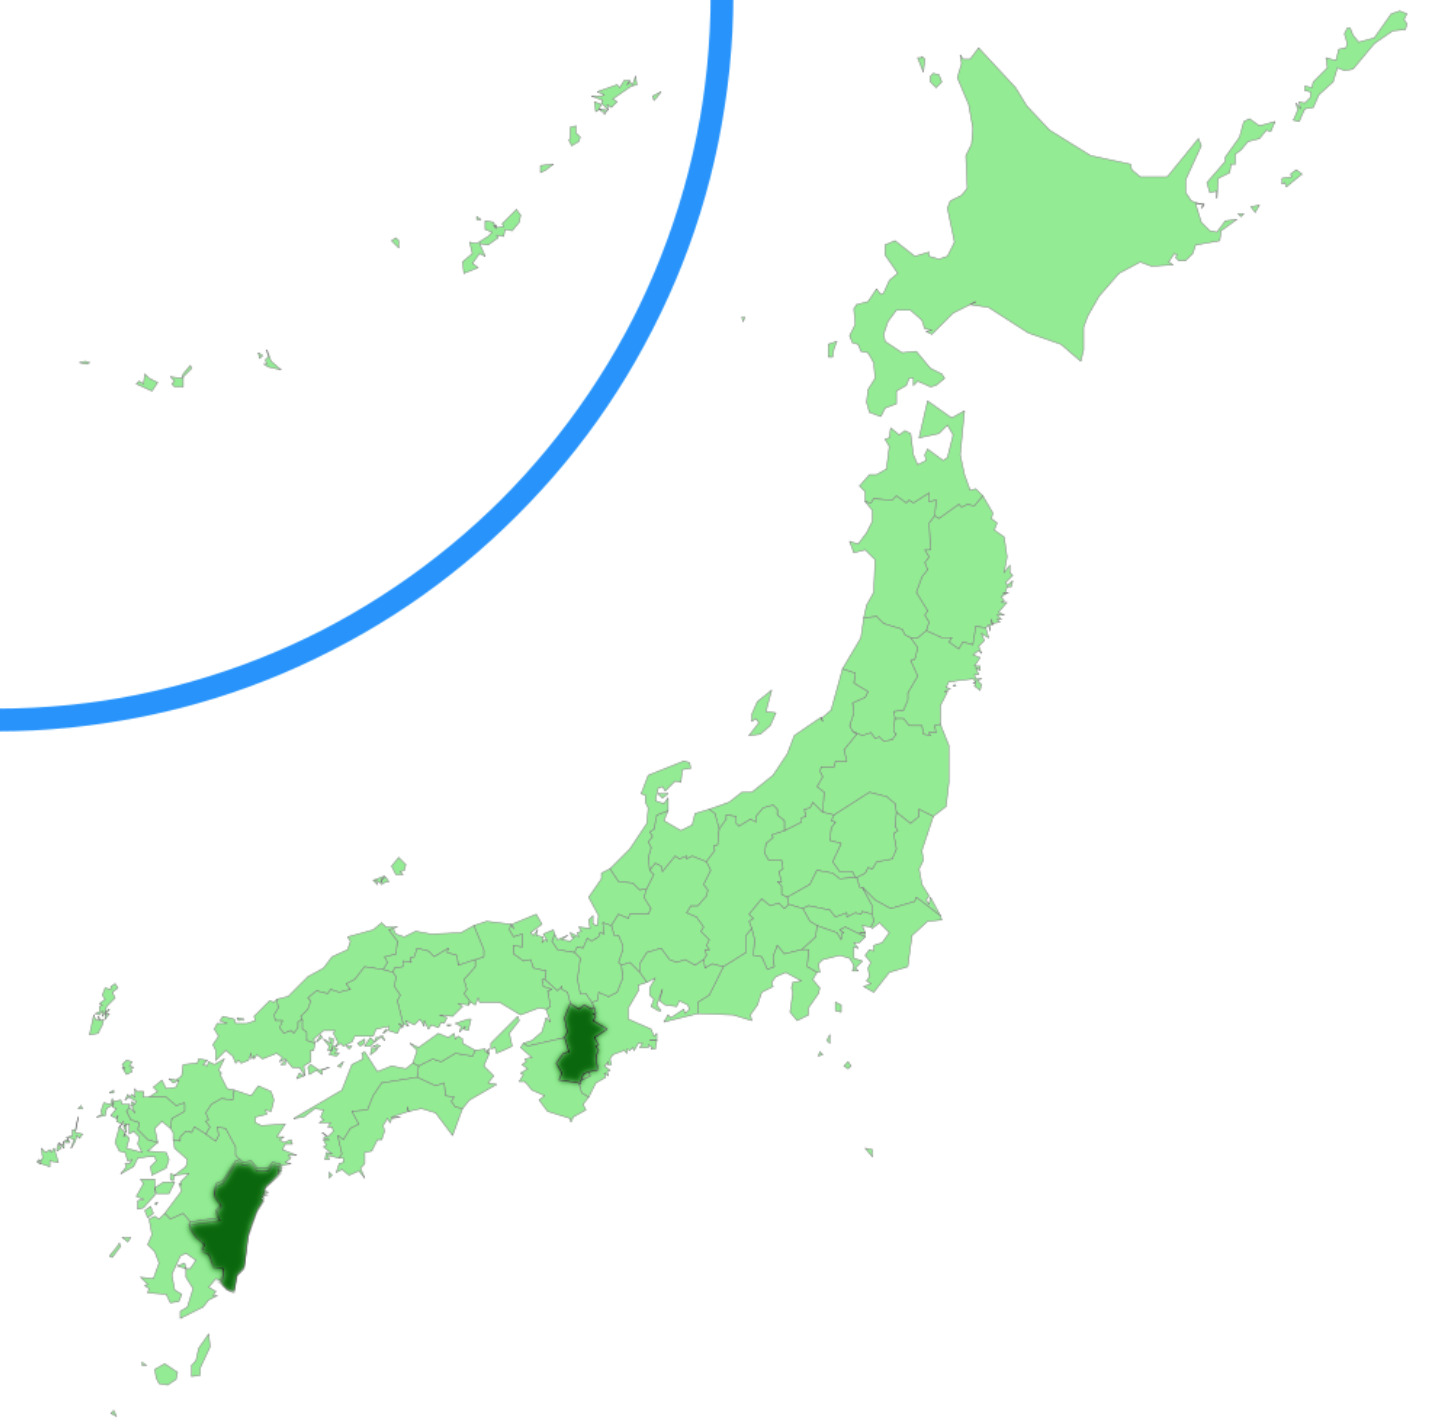 Chorioactis geaster  distribution.